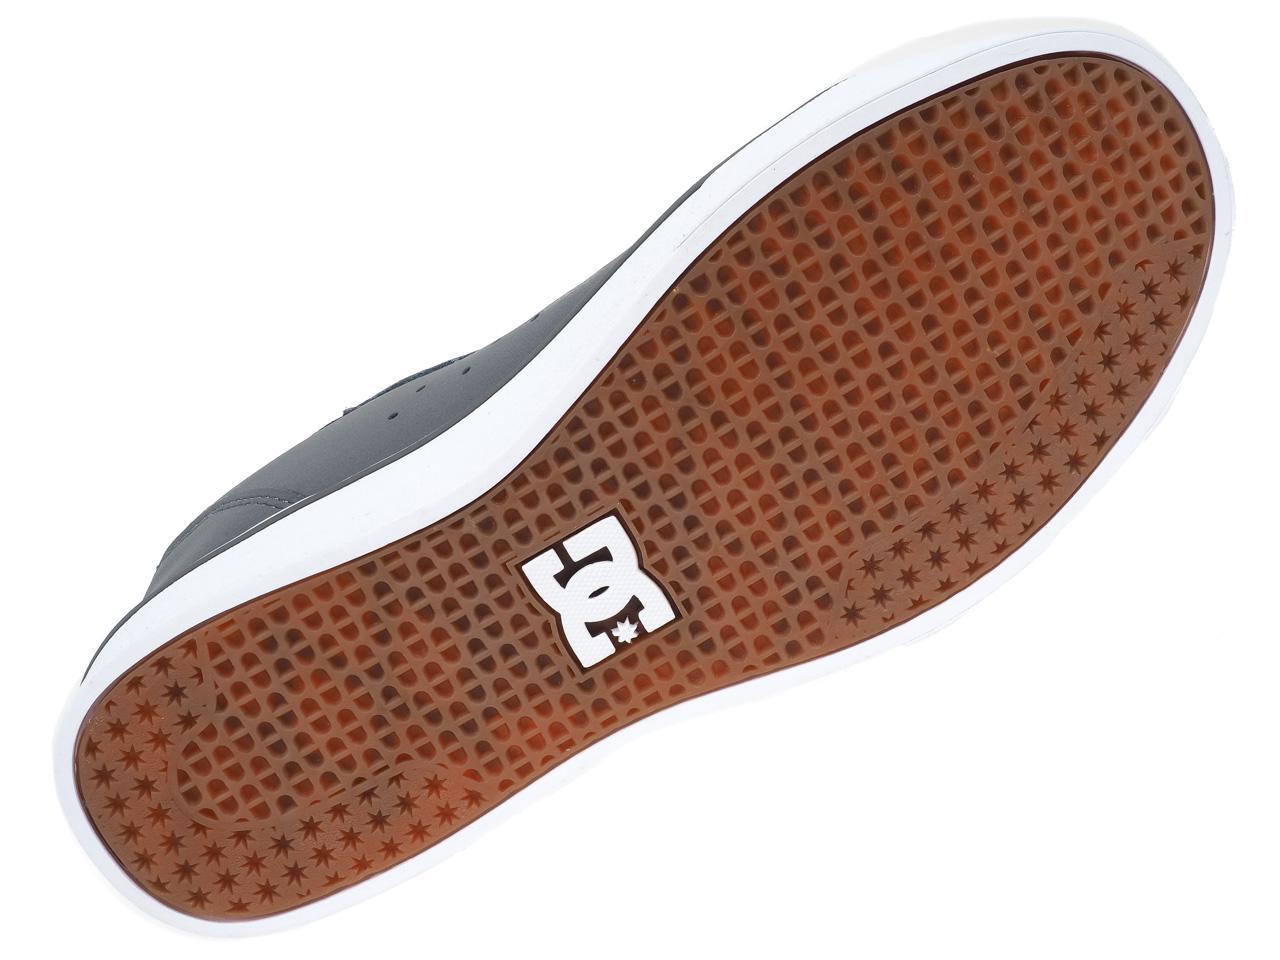 Chaussures skateboard Notch jr grey ue3MnFgTCT